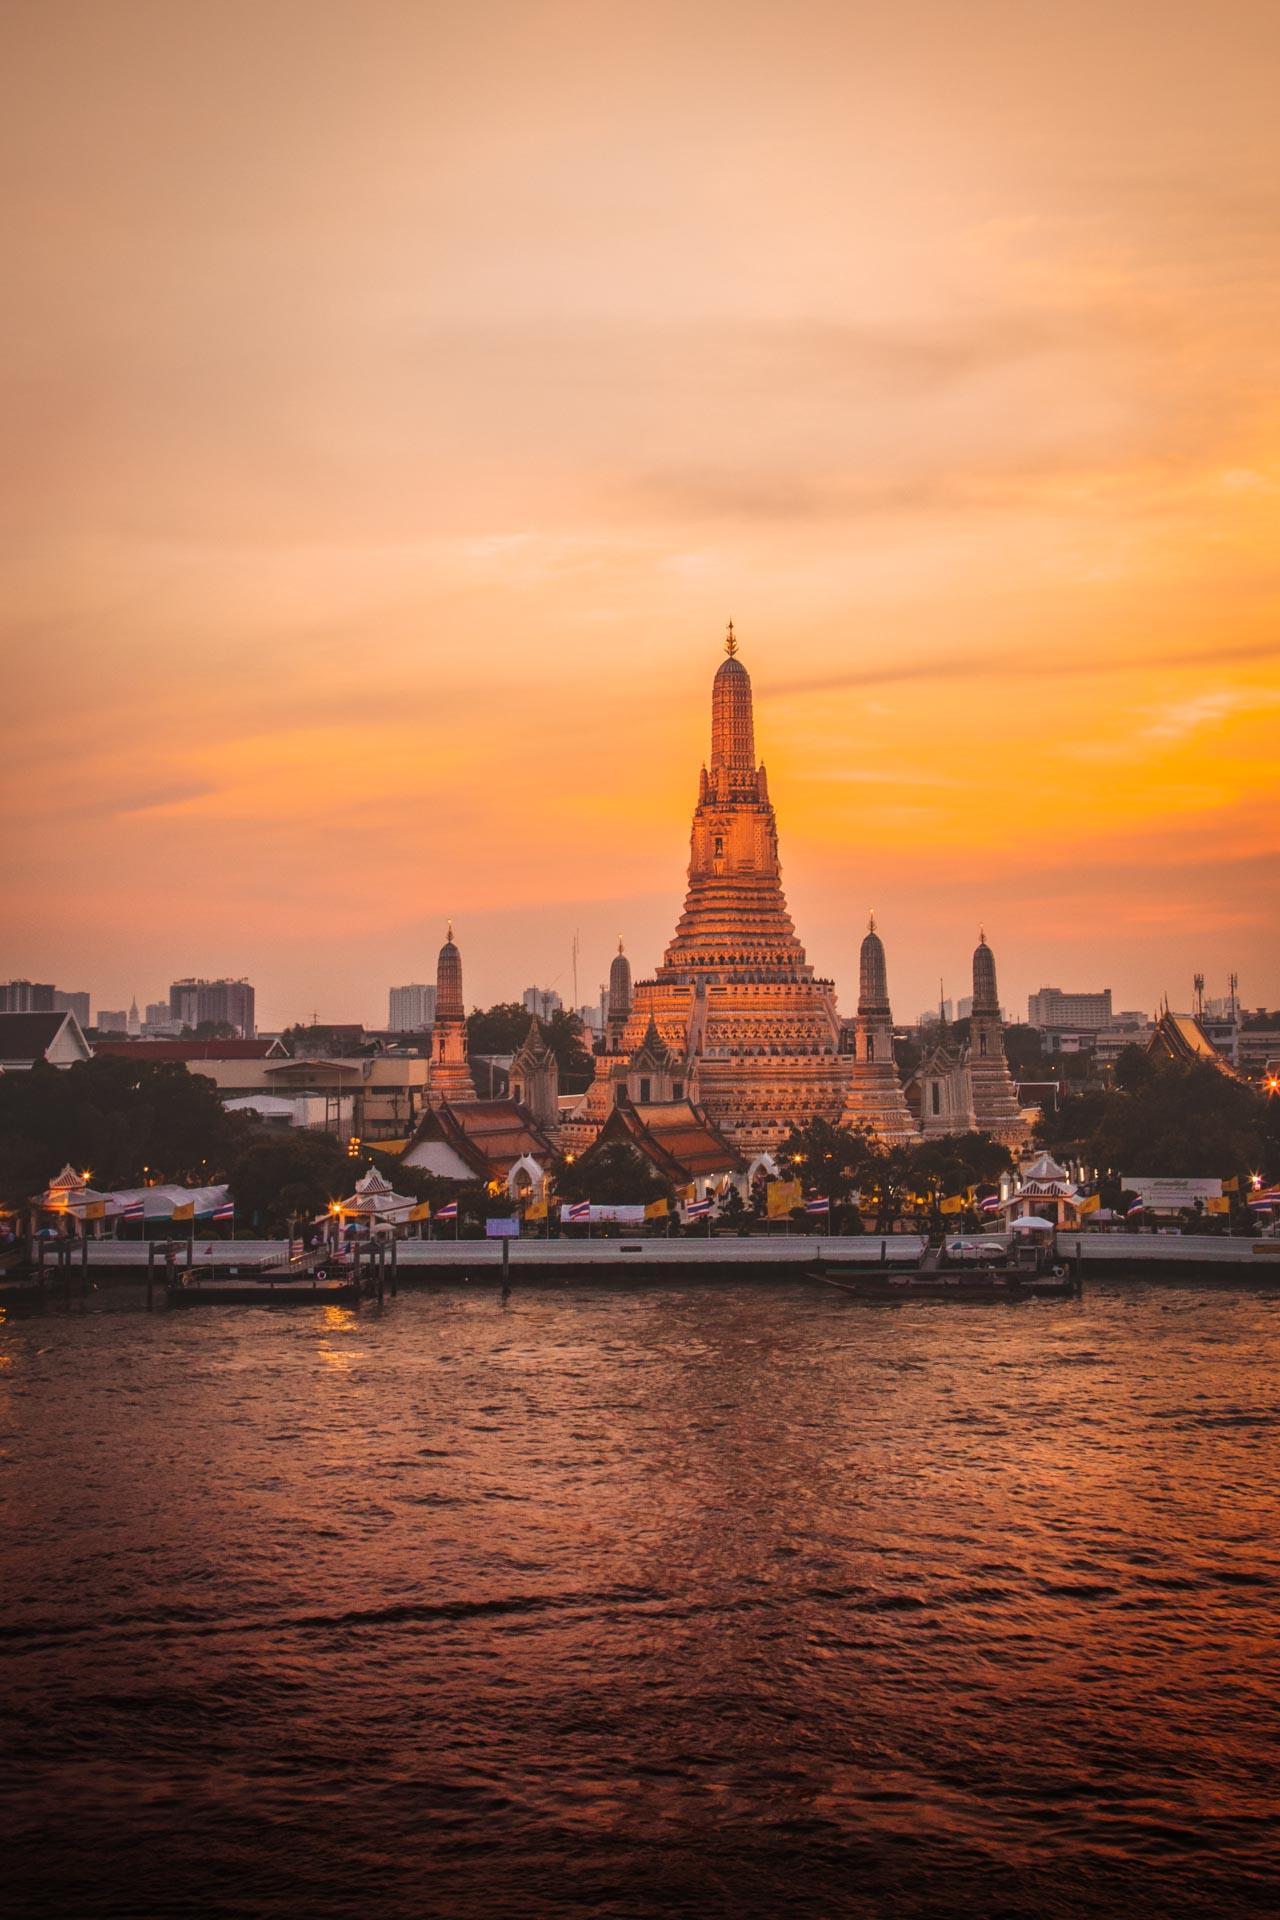 Wat Arun, Chao Phraya River, sunset, Thonburi, Bangkok